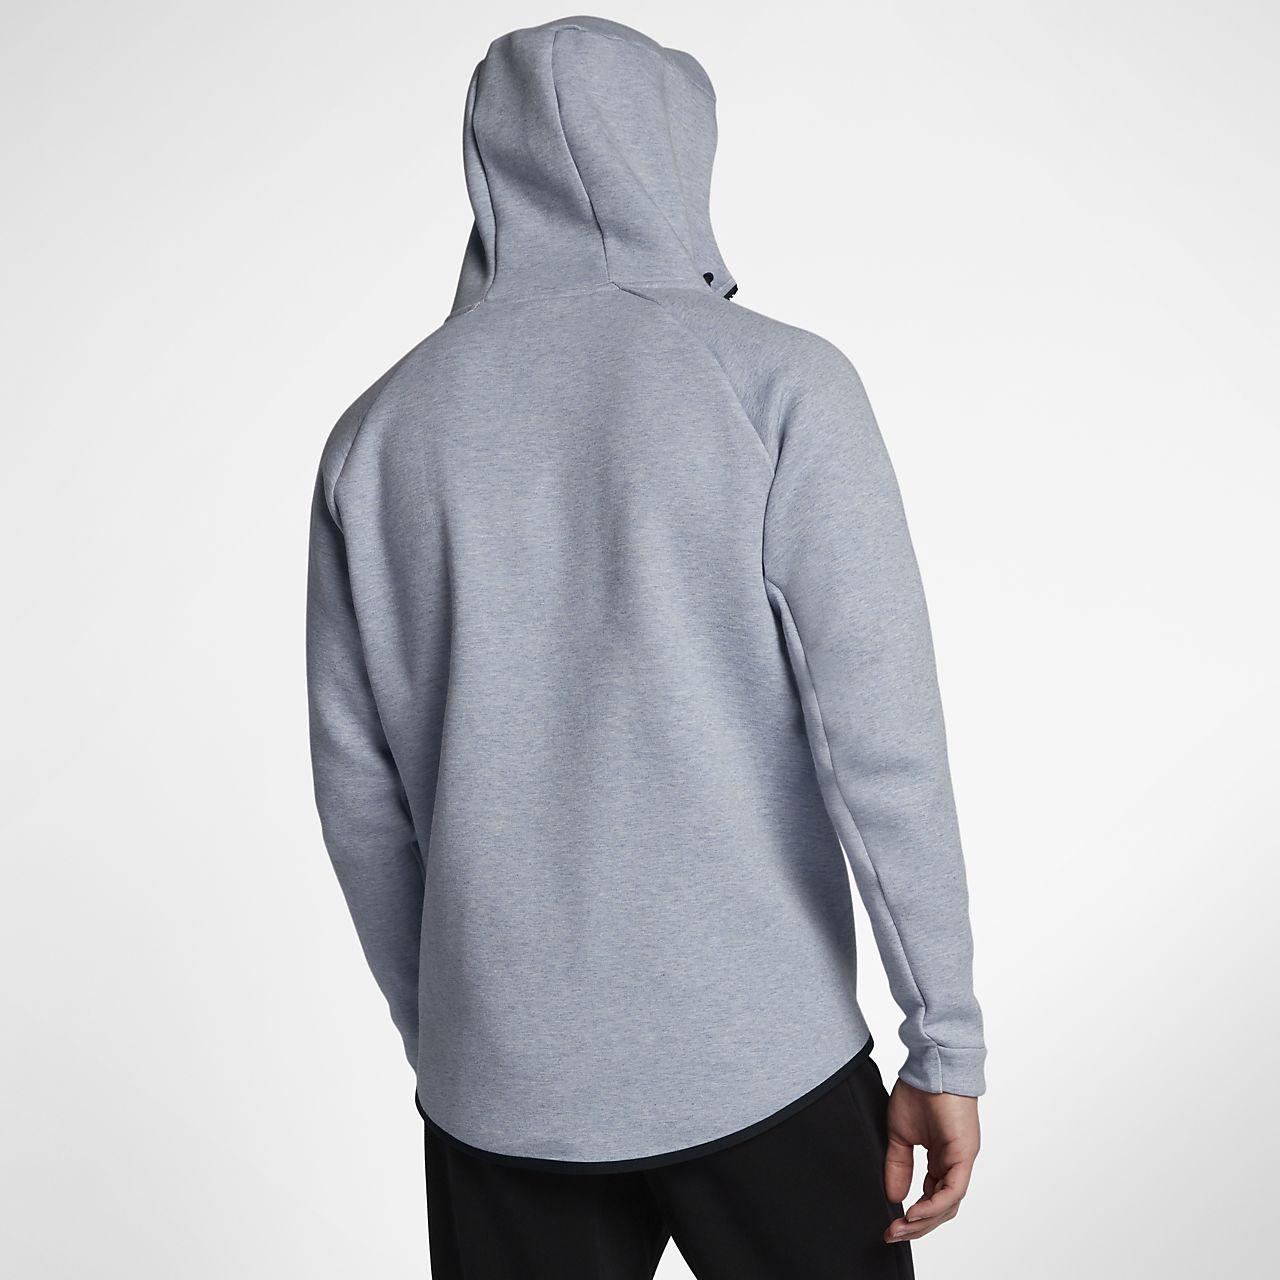 nike tech fleece hoodie kids 2016 online   OFF72% Discounts 3c0986370e